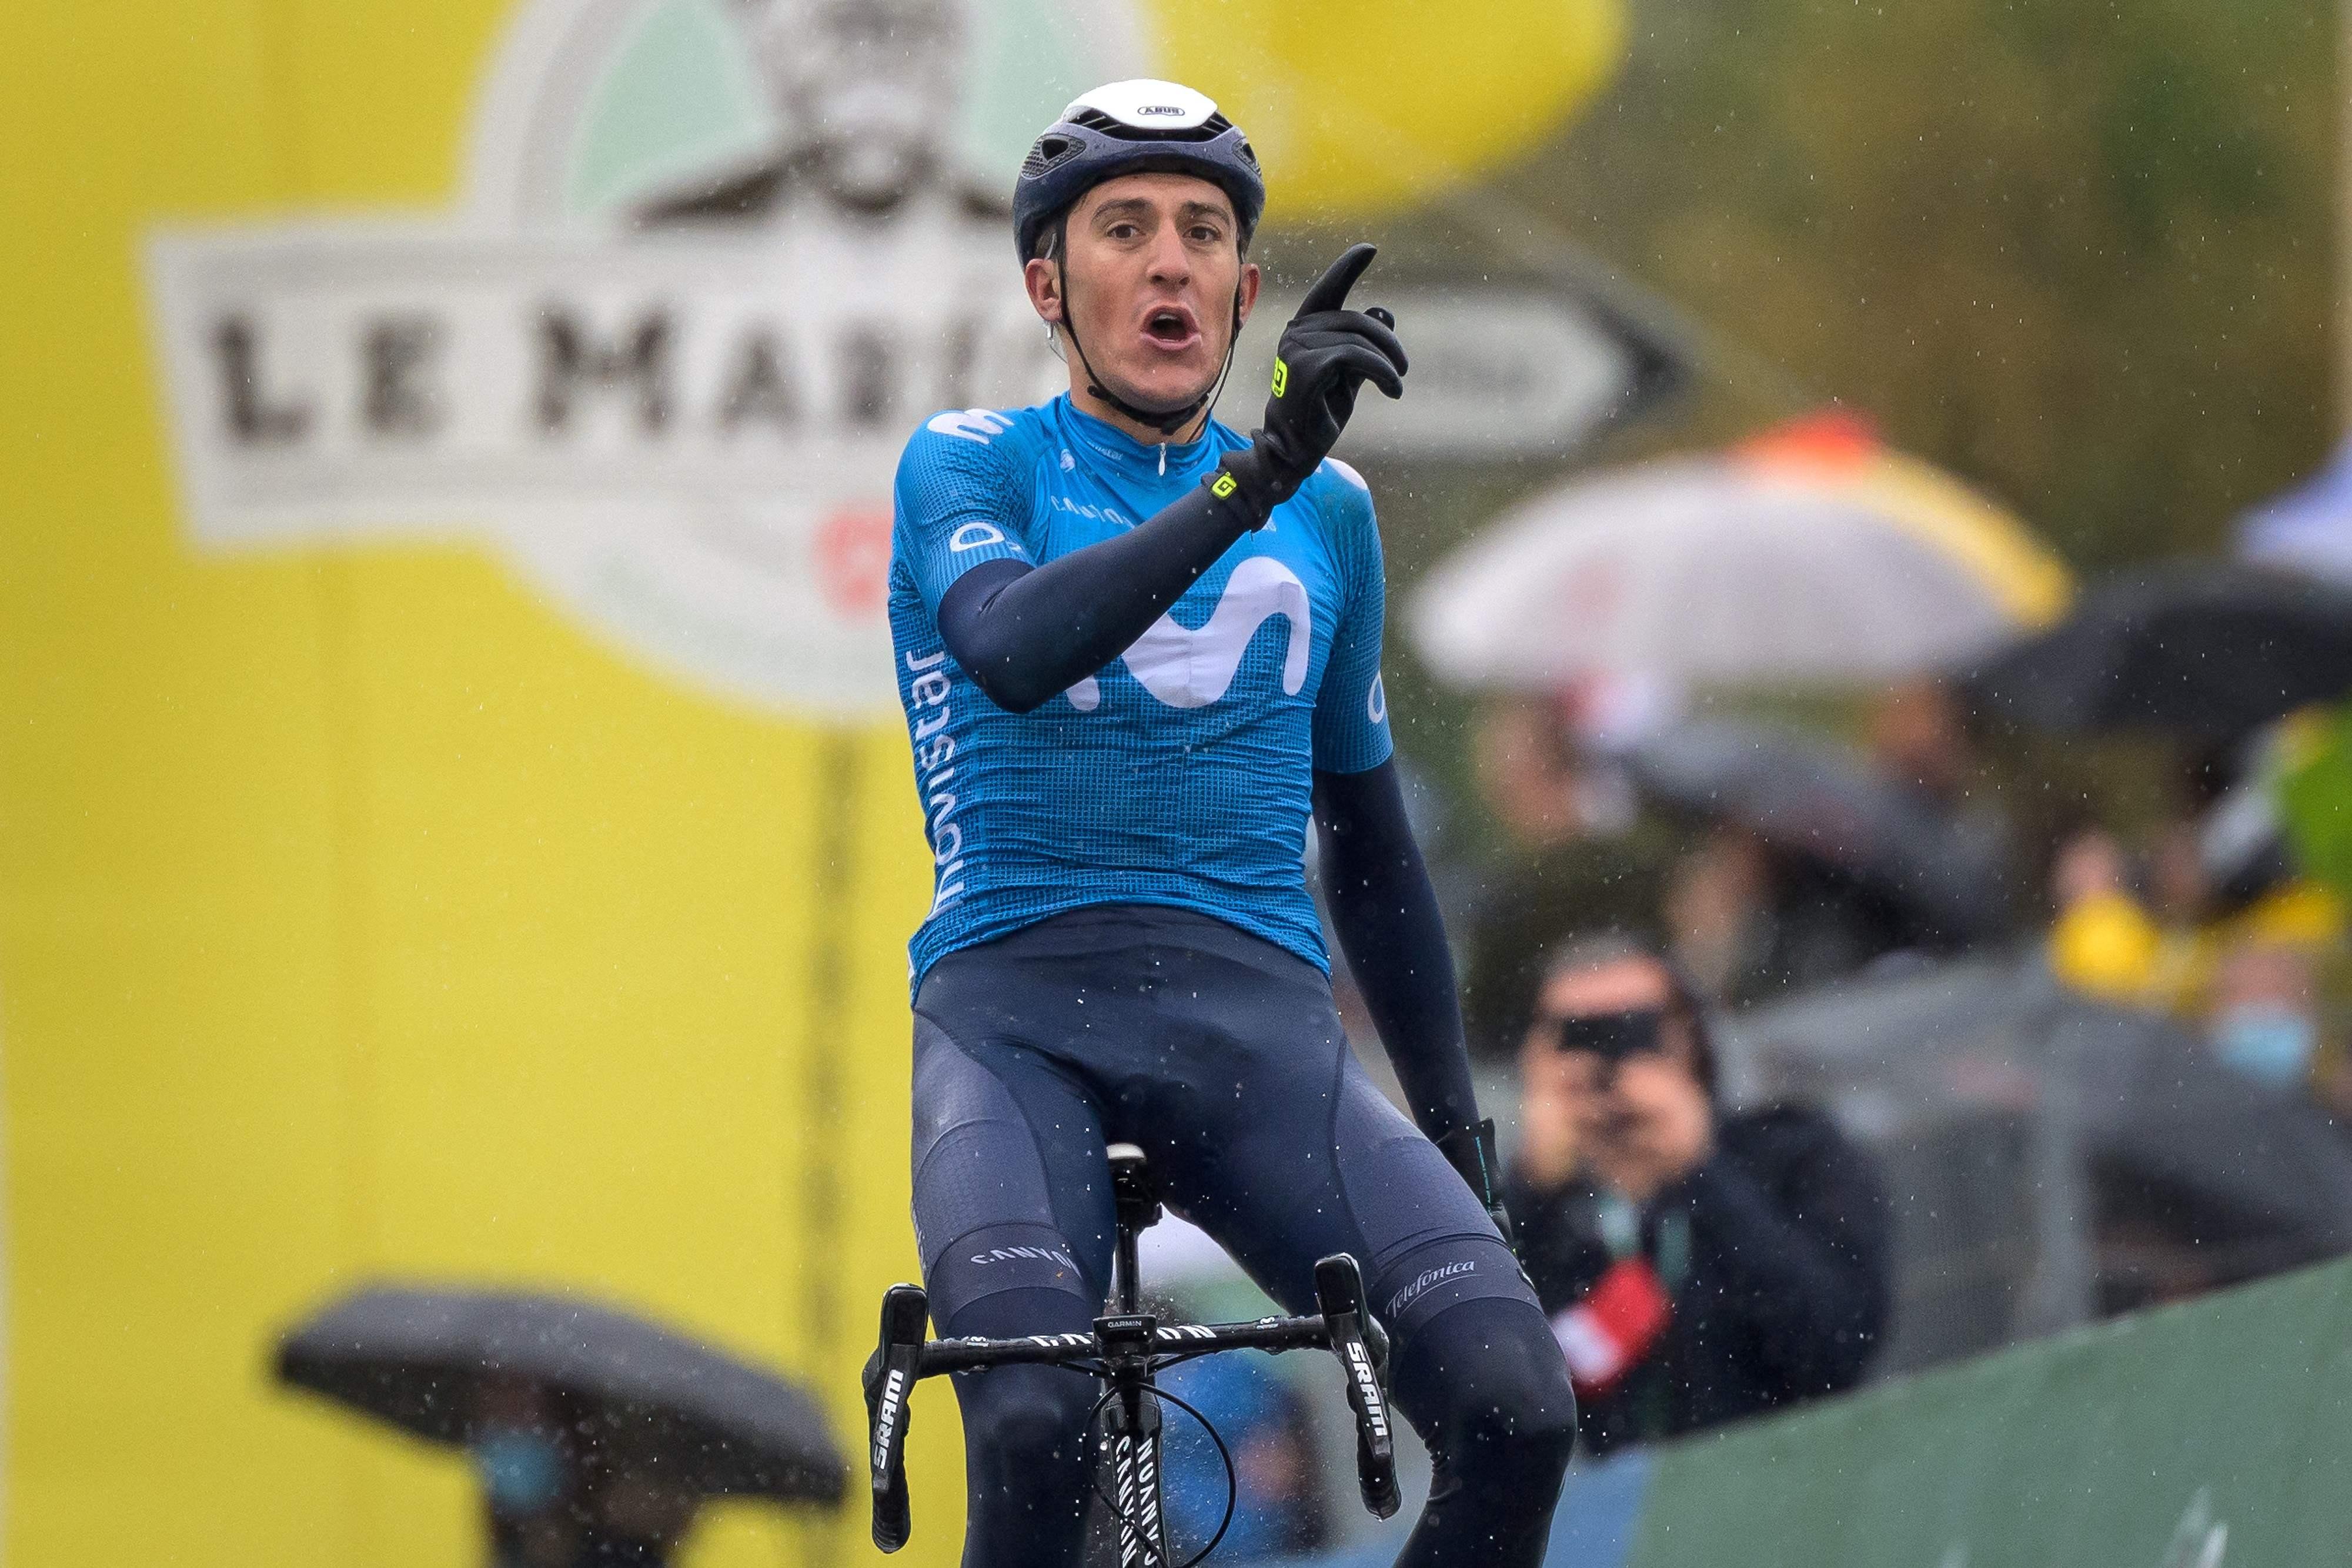 Marc Soler celebra su victoria en la etapa.